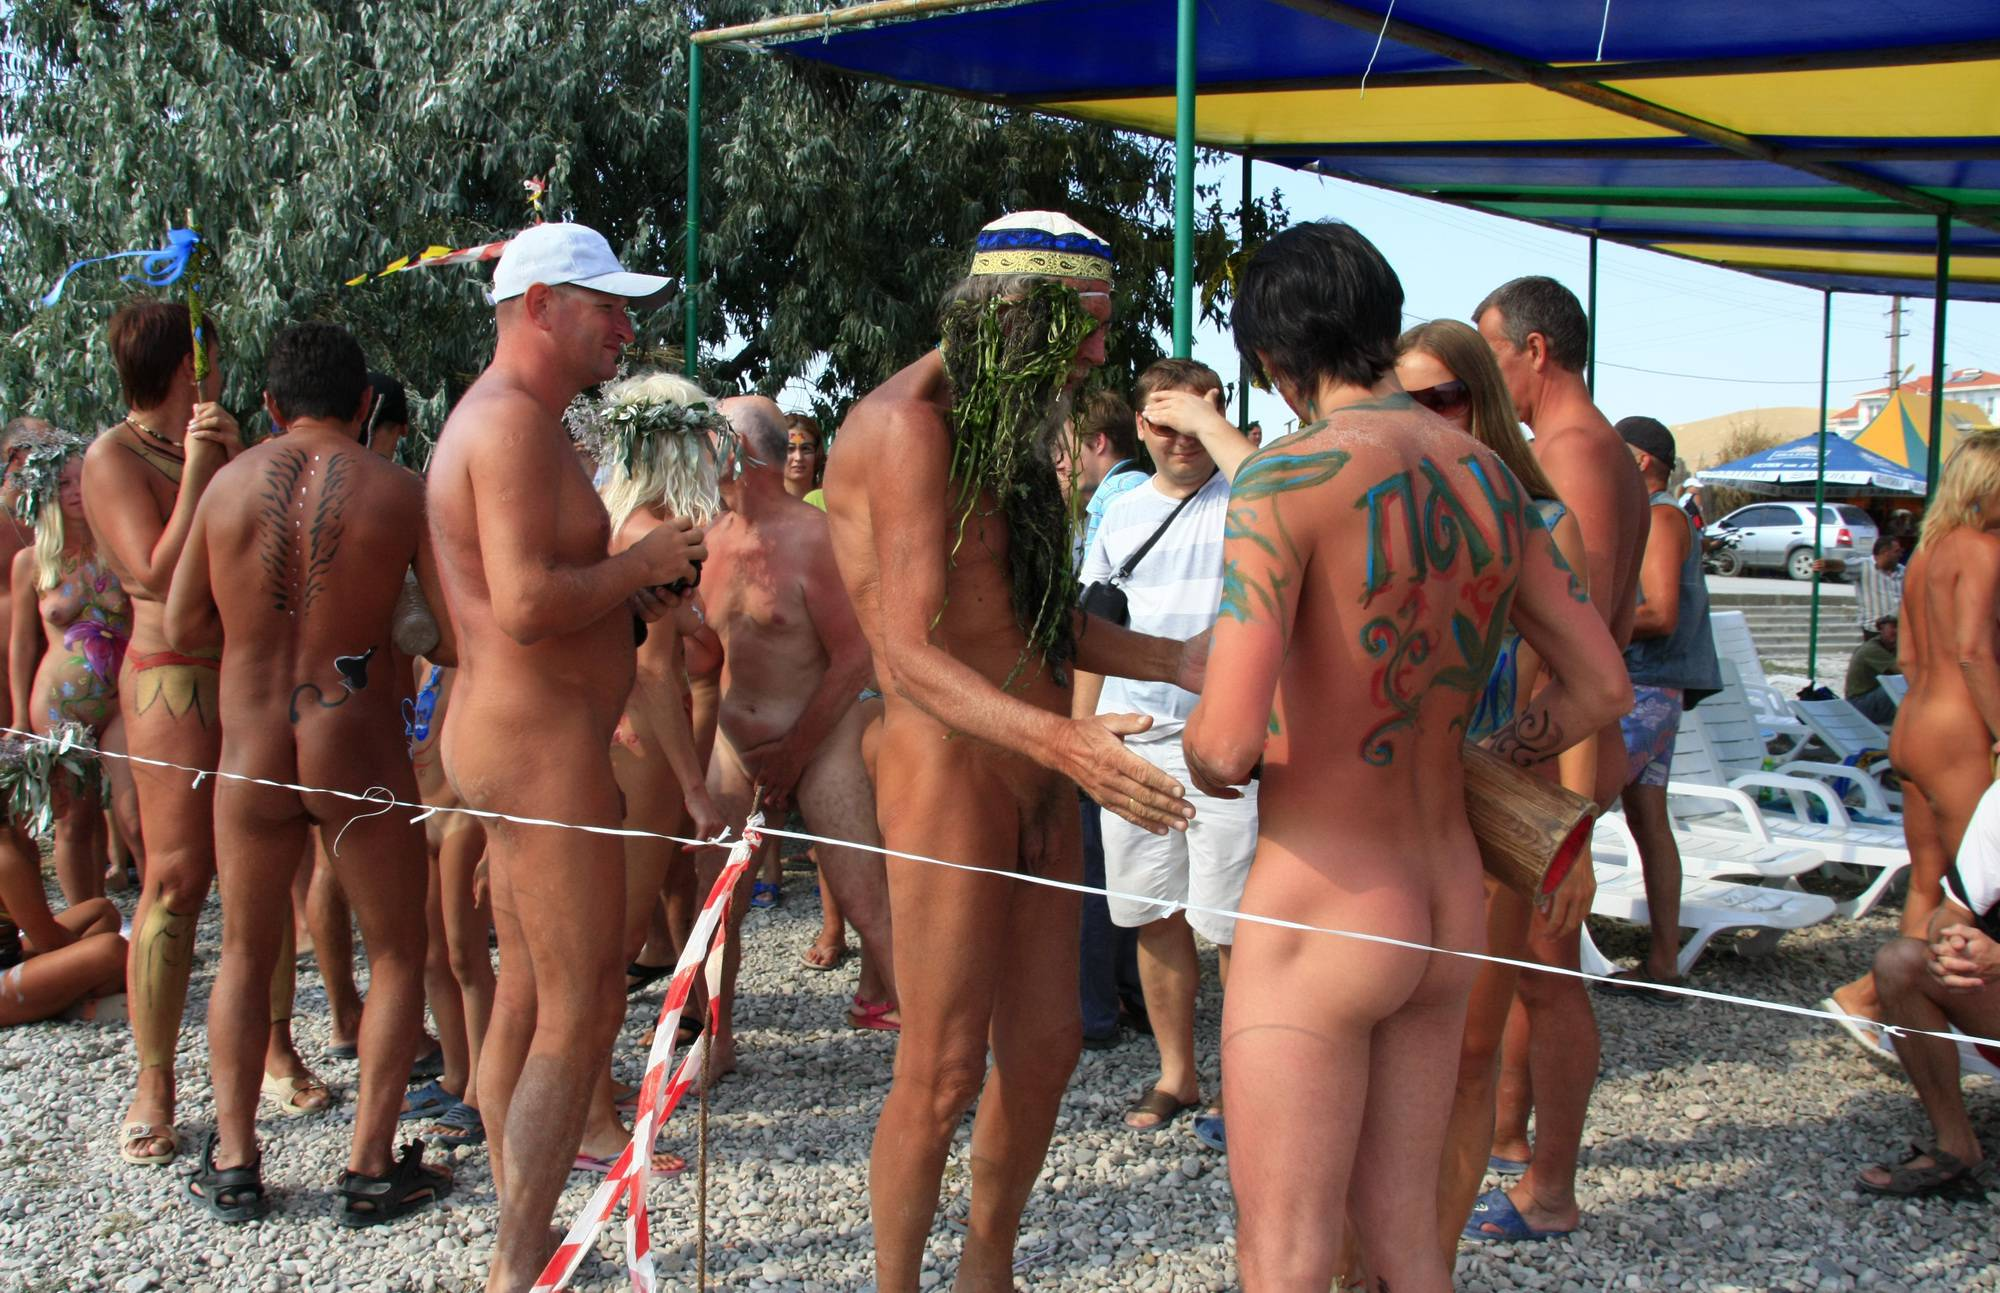 Nudist Photos Ukrainian Water Drying Off - 1